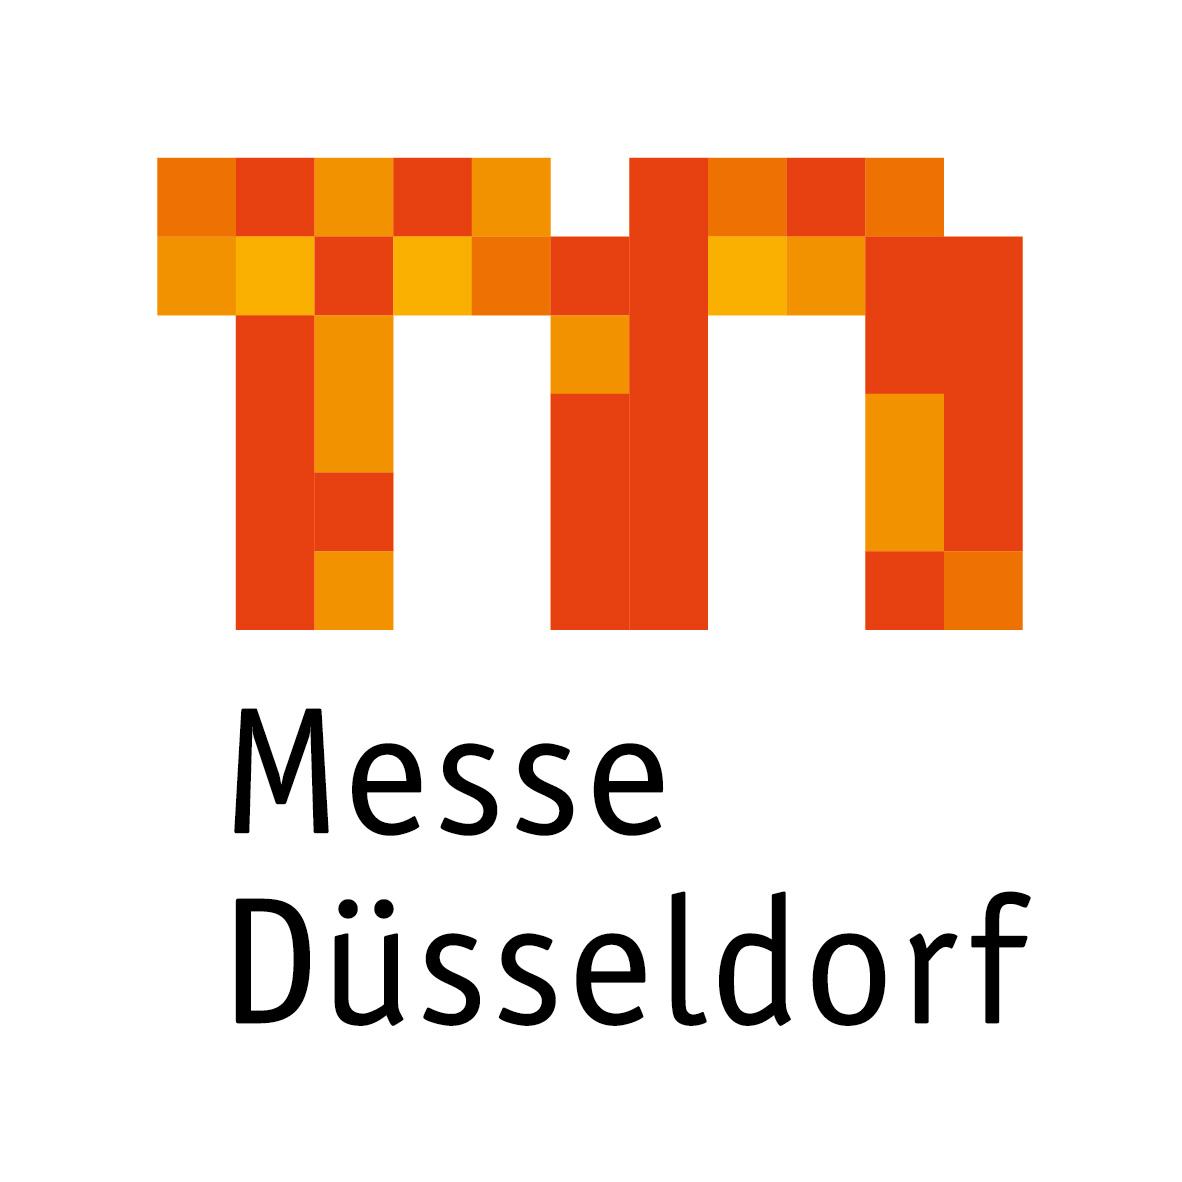 Messe Duesseldorf GmbH